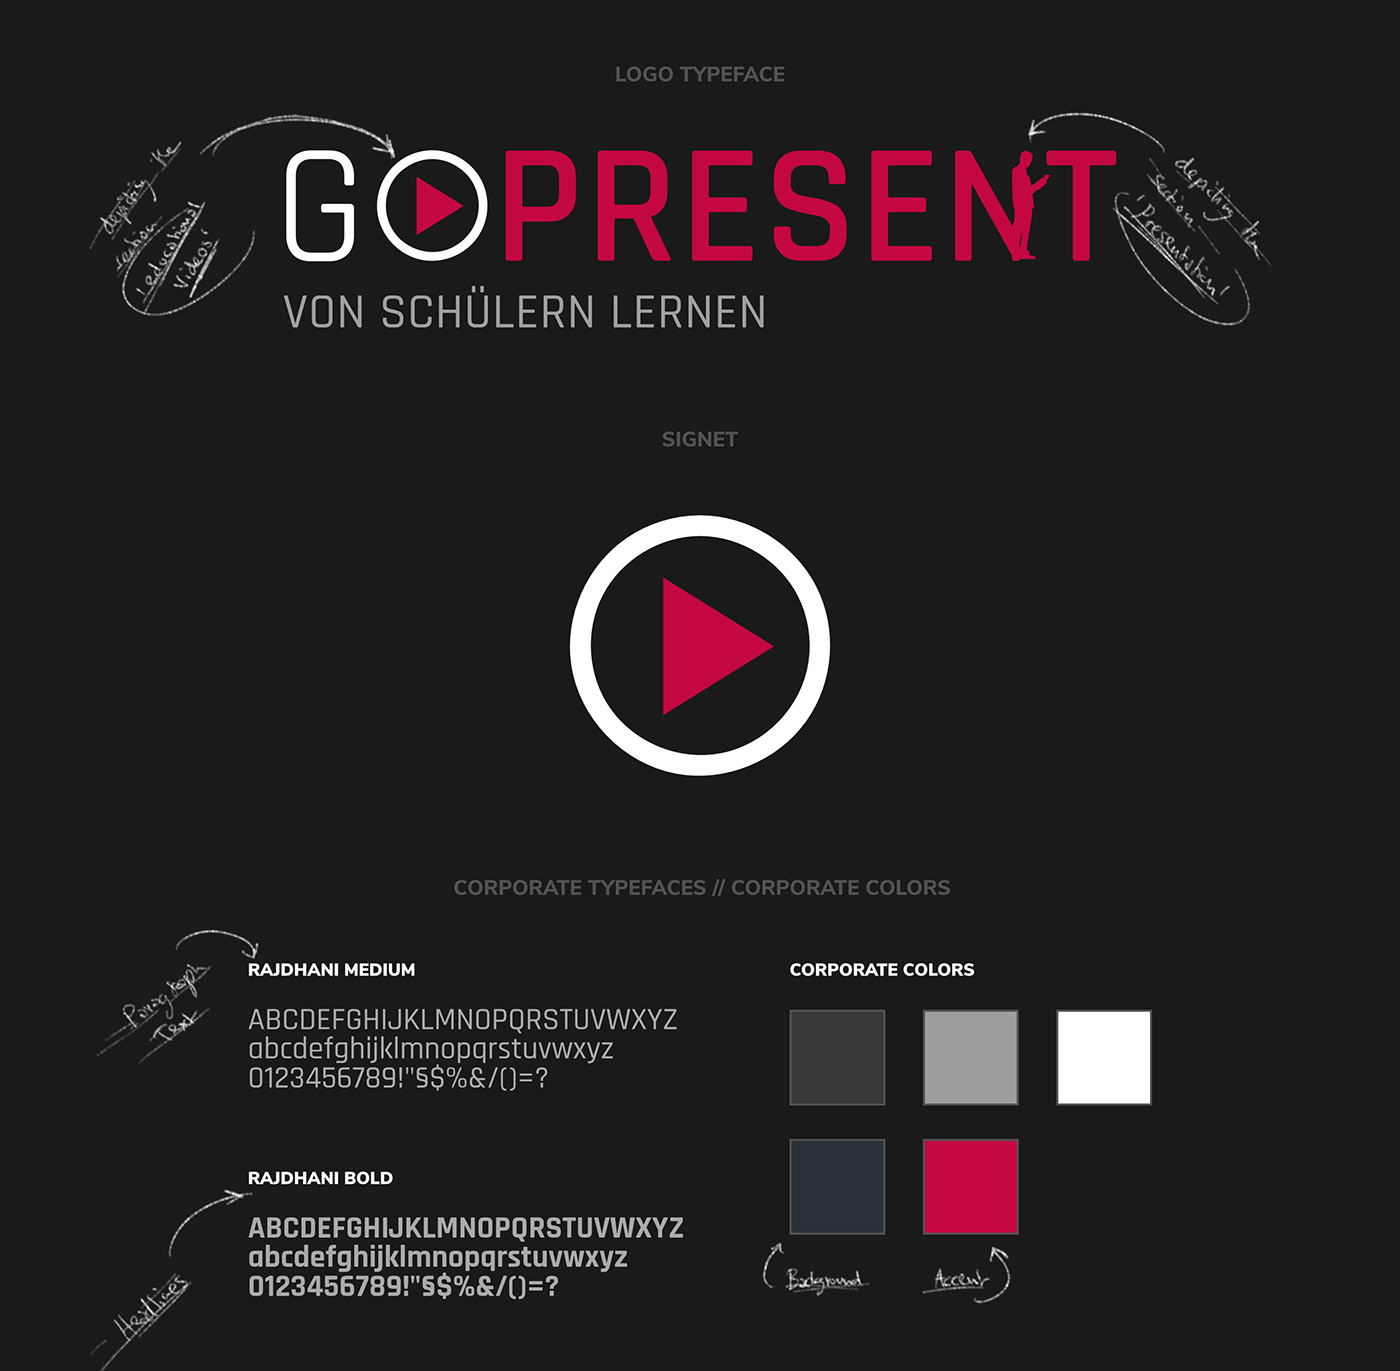 GO PRESENT // Logo + Colors + Typeface